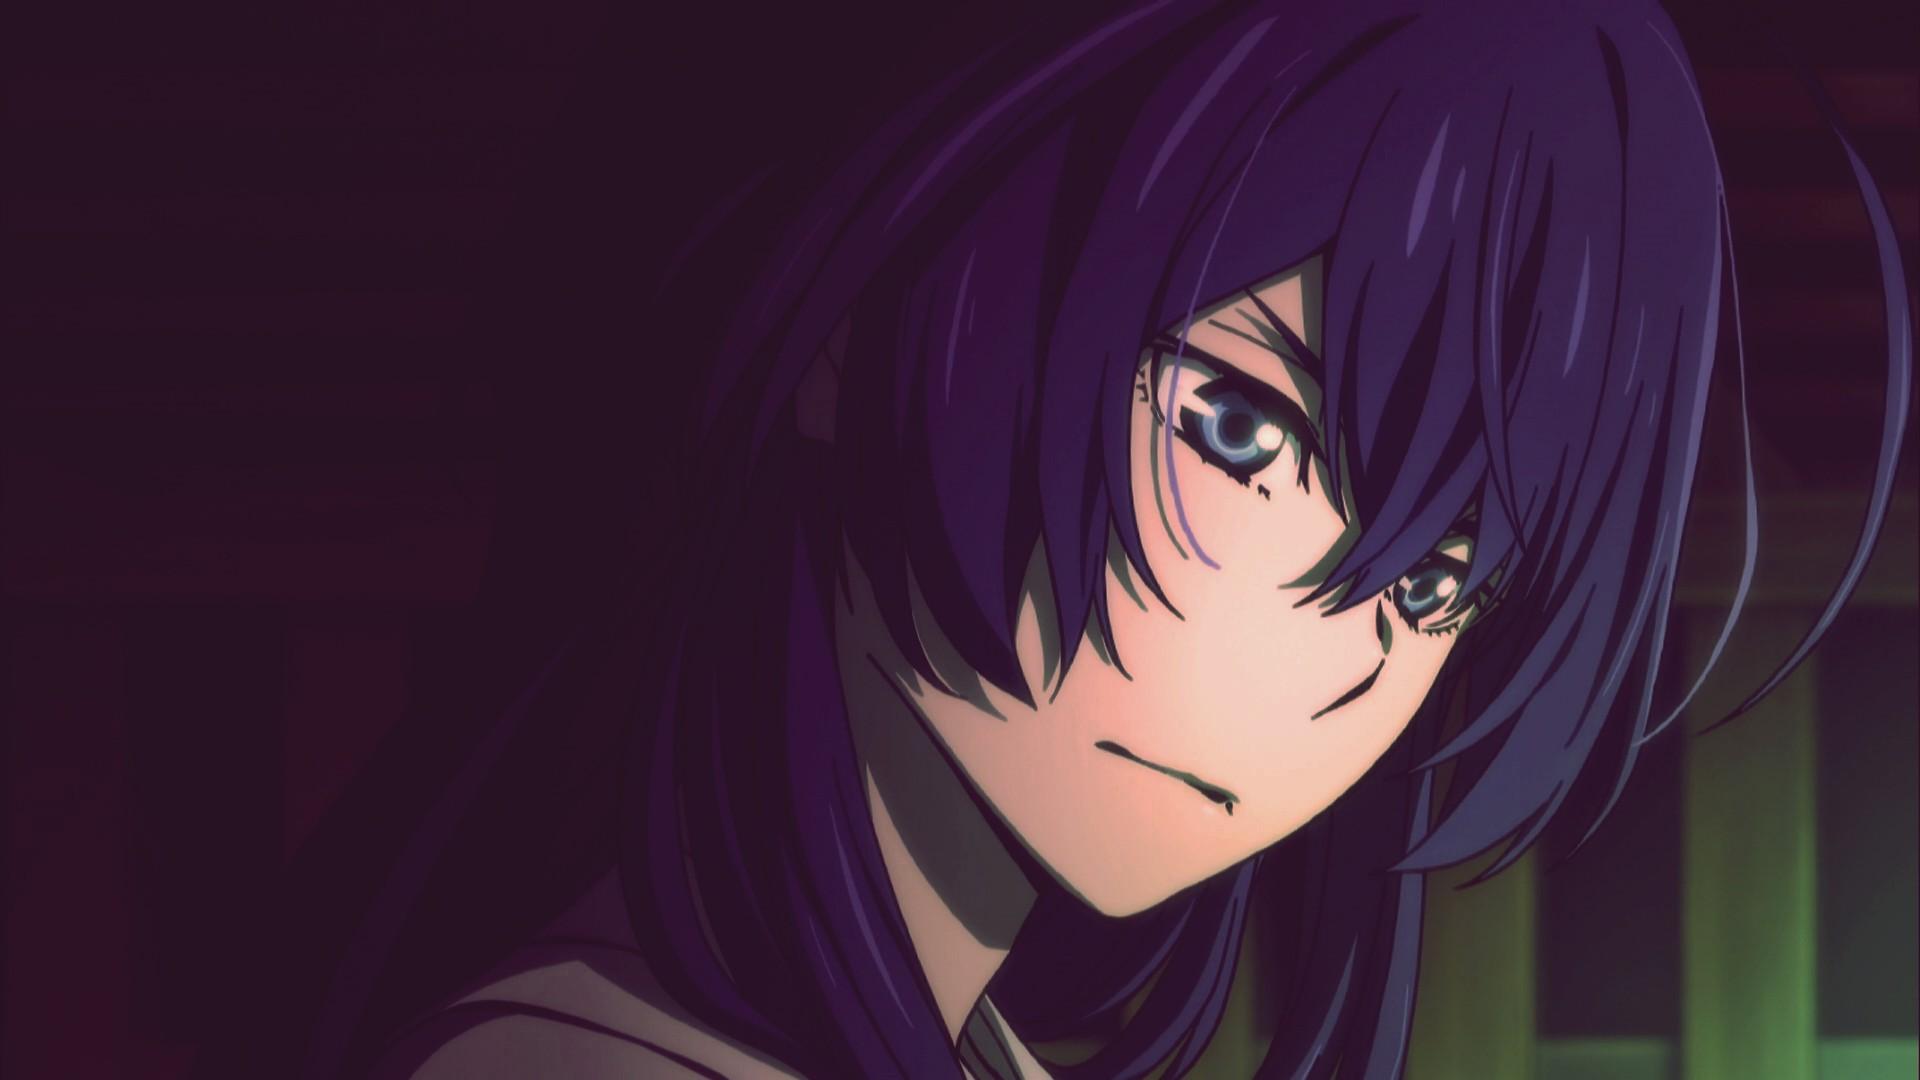 Wallpaper : anime girls, artwork, black hair, Bungou Stray